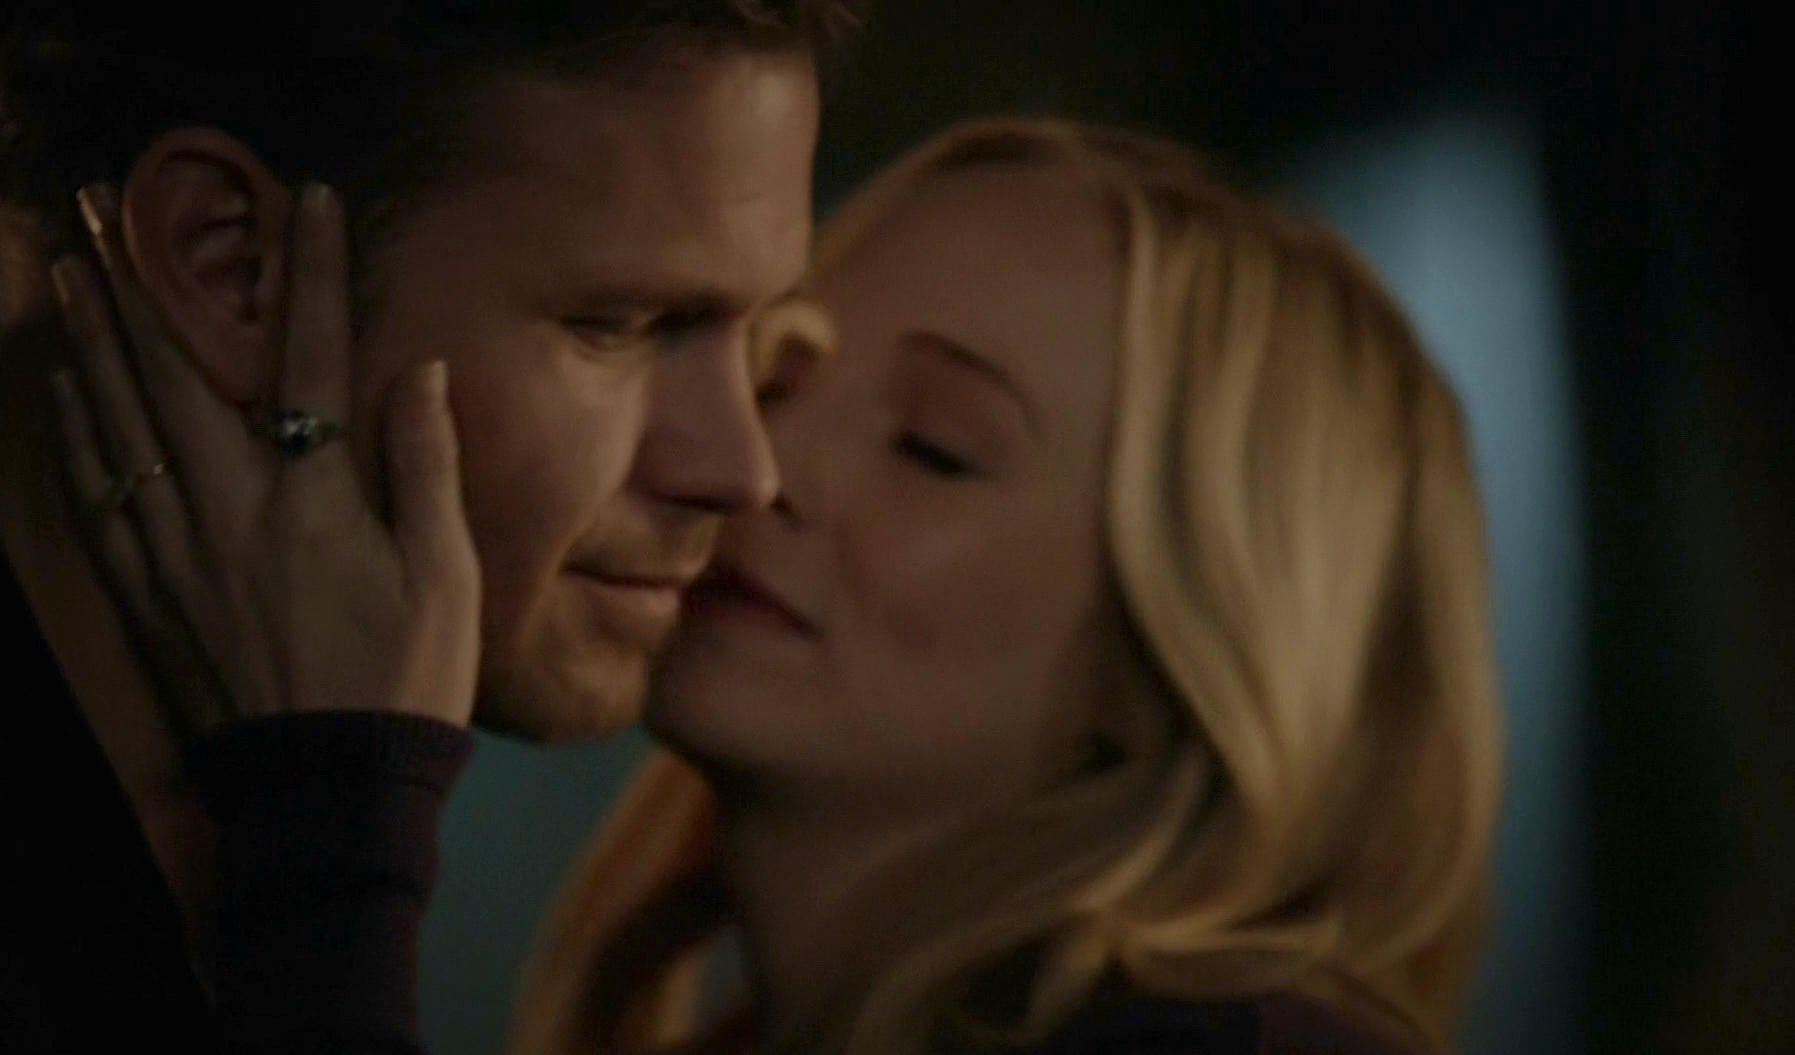 Caroline embraces Alaric warmly with hand across his cheek